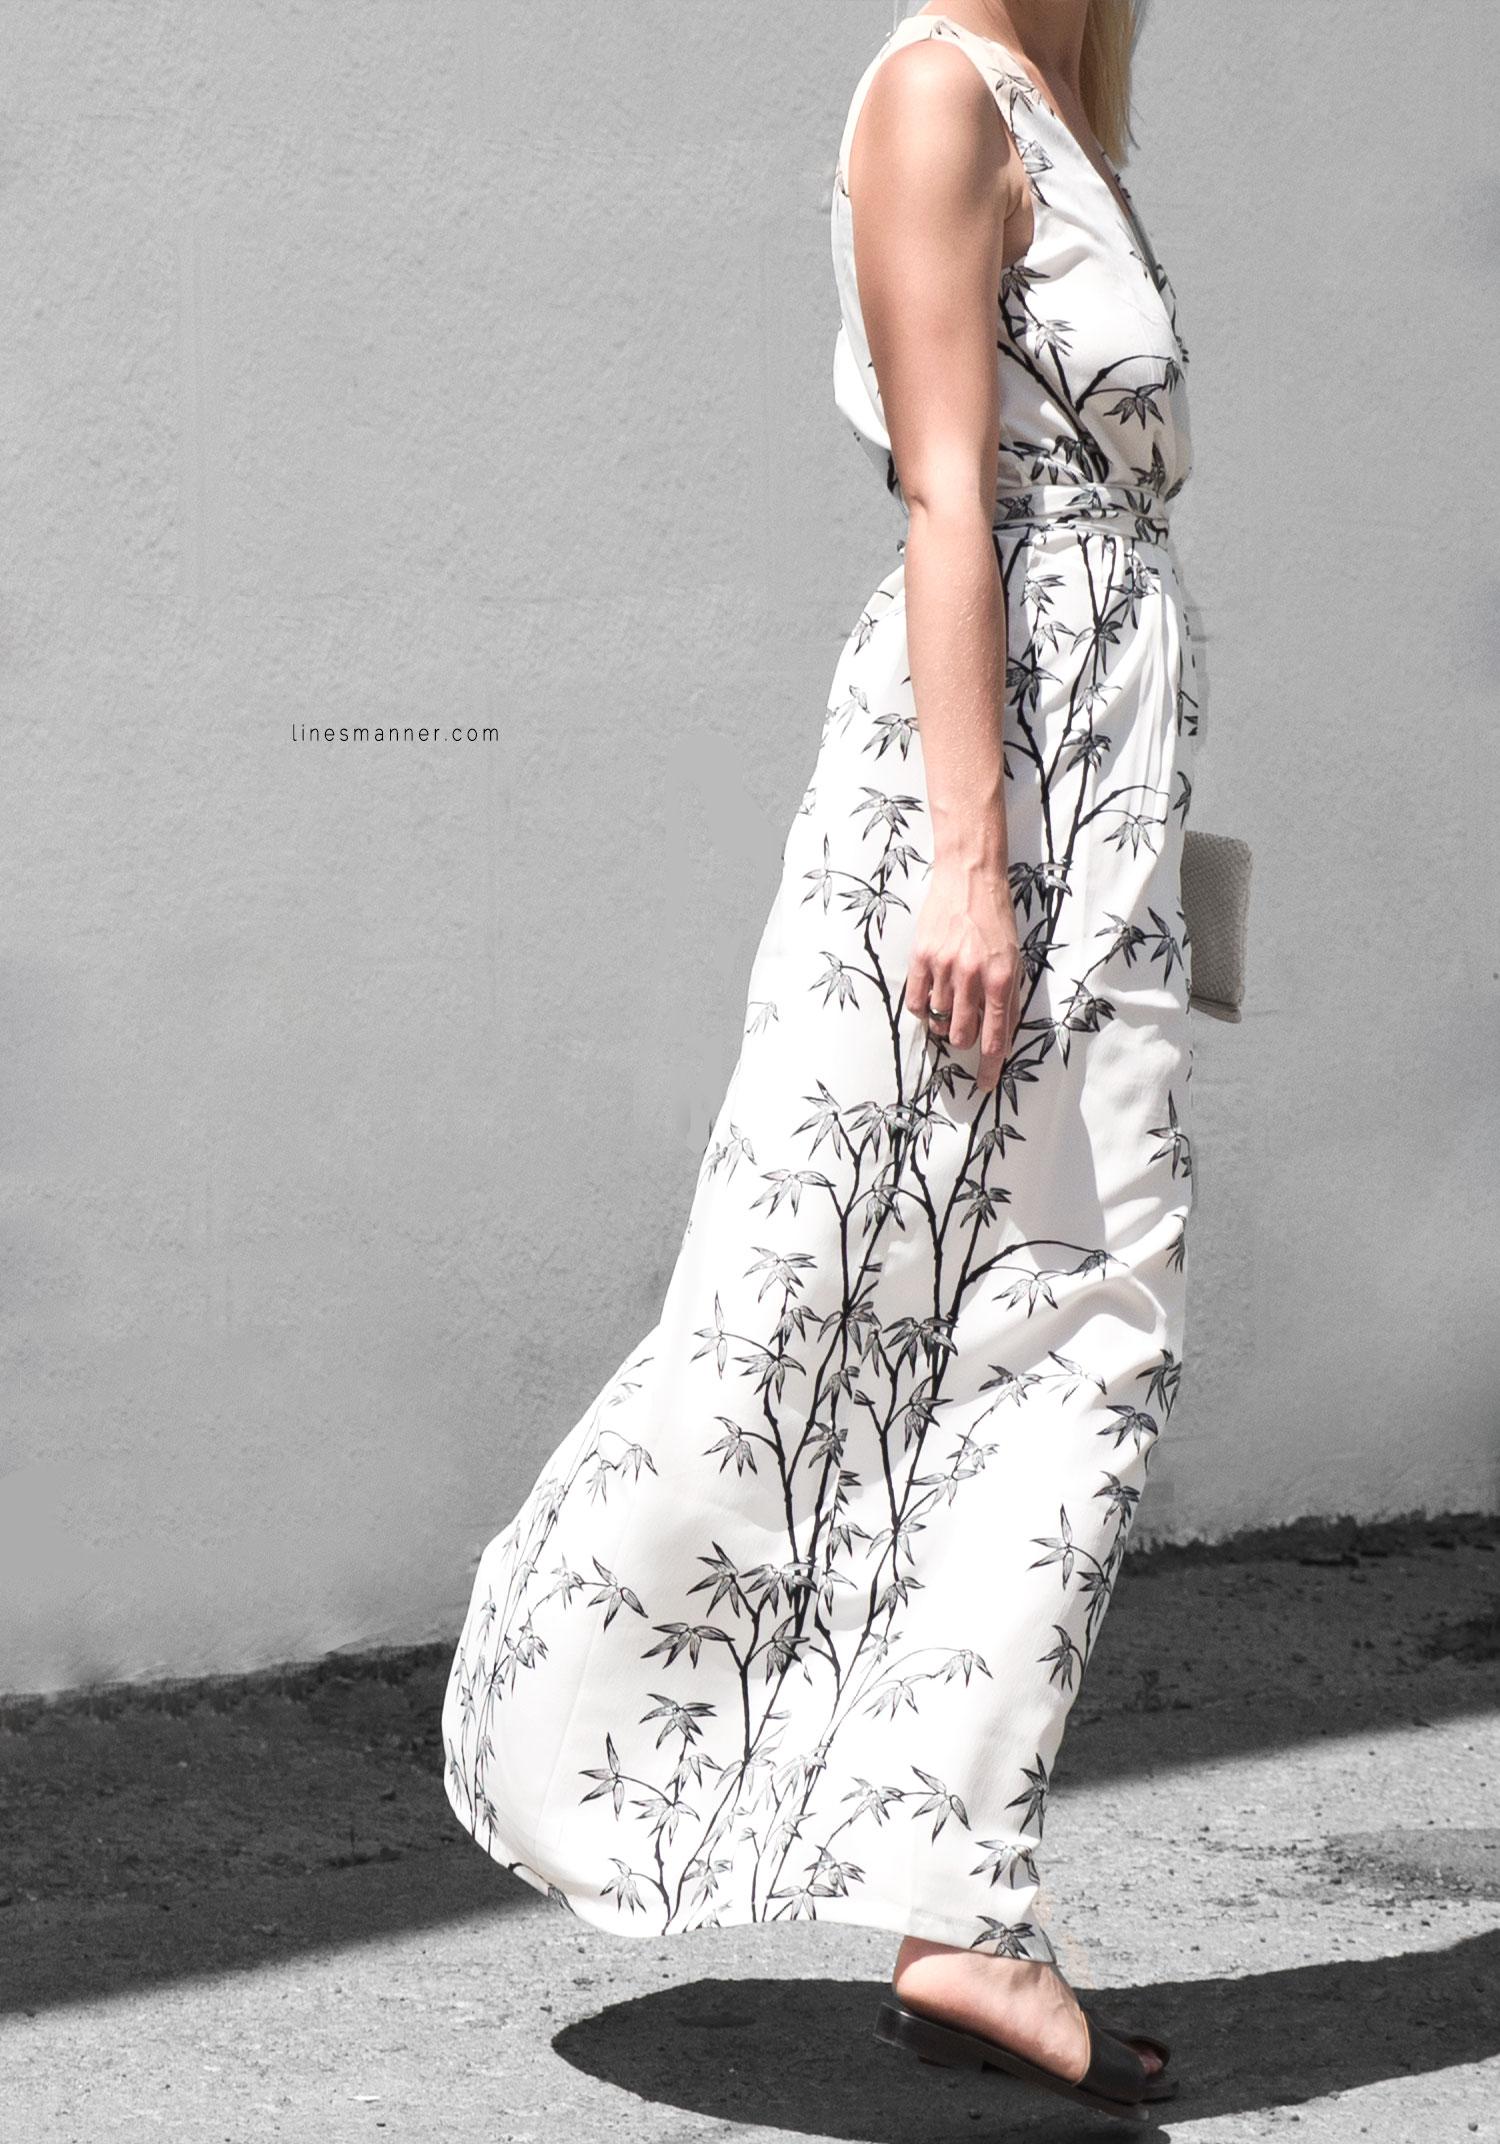 Lines-Manner-Minimal-Simplicity-Essentials-Bon_Label-Neon_Rose_Print-Bamboo-Slit_Dress-Wrap_Dress-Maxi_Dress-Fesh-Black_and_White-Casual-Elegant-Bright-Monochrome-15